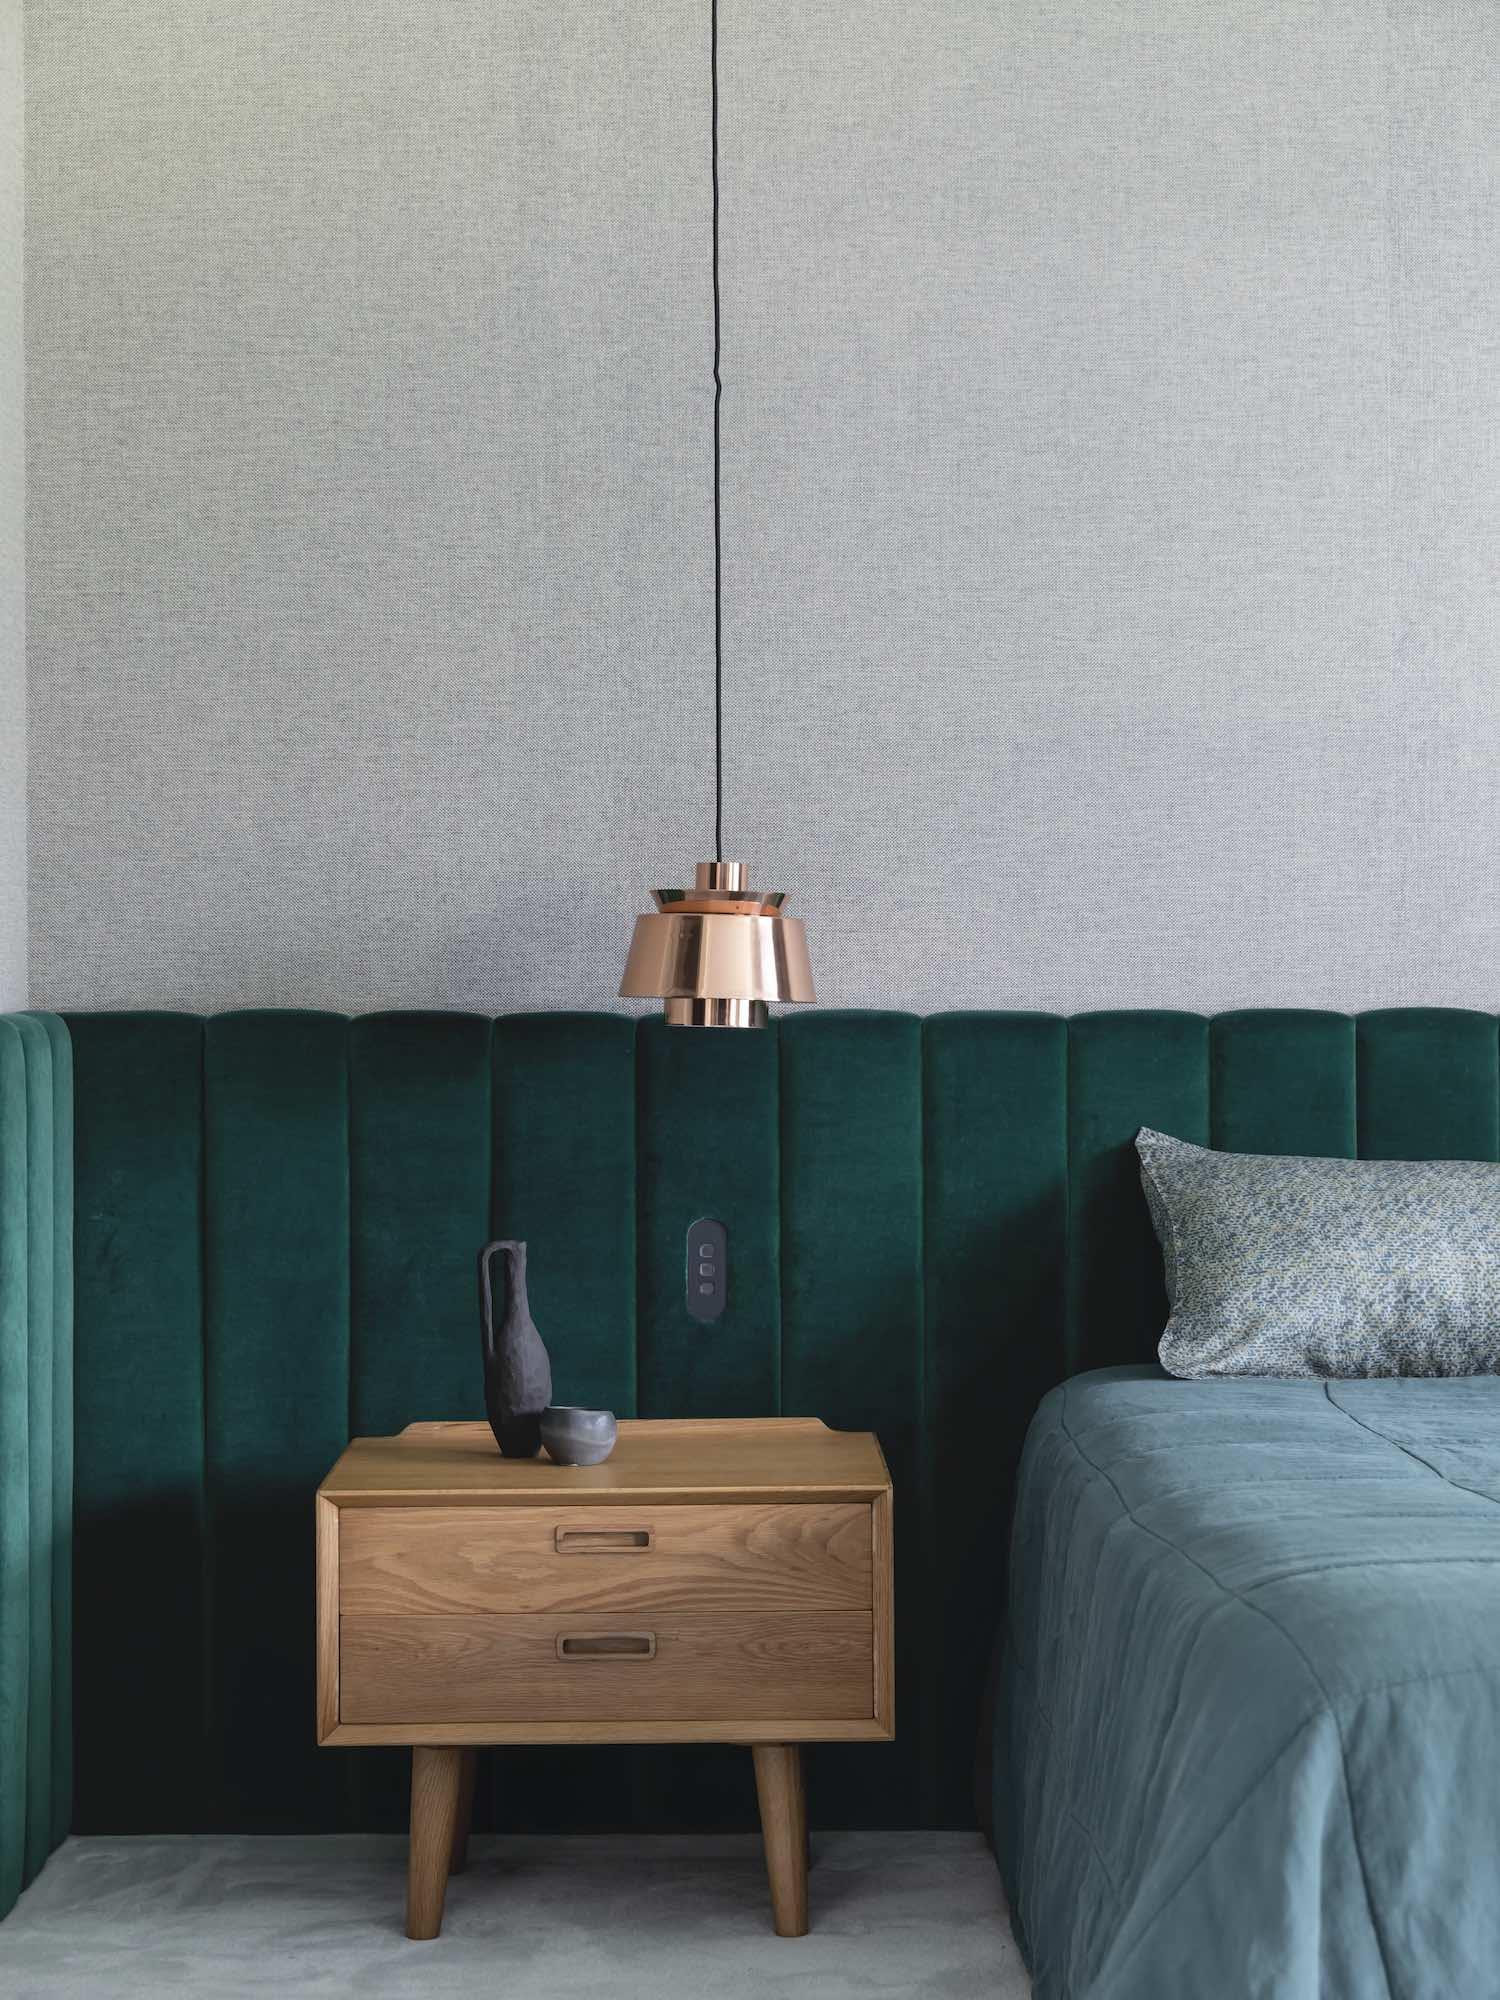 Bedroom Lindfield House Bedroom By Daniel Boddam Est